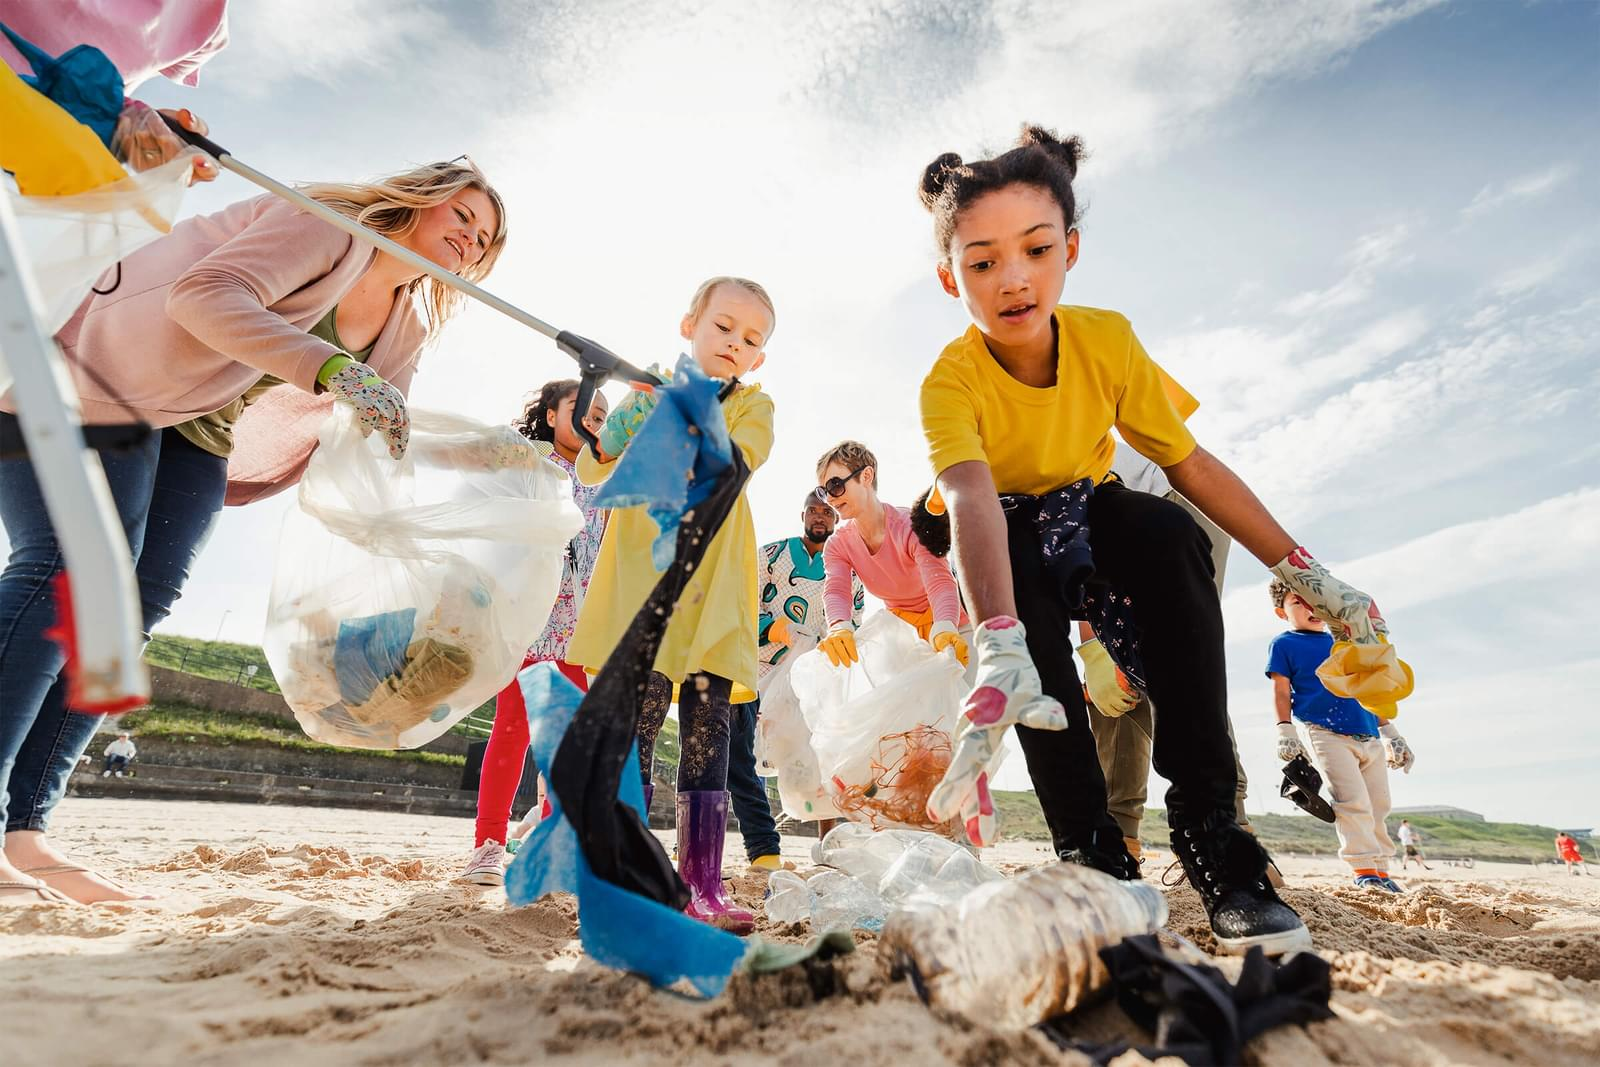 Kids walking on the beach picking up plastic